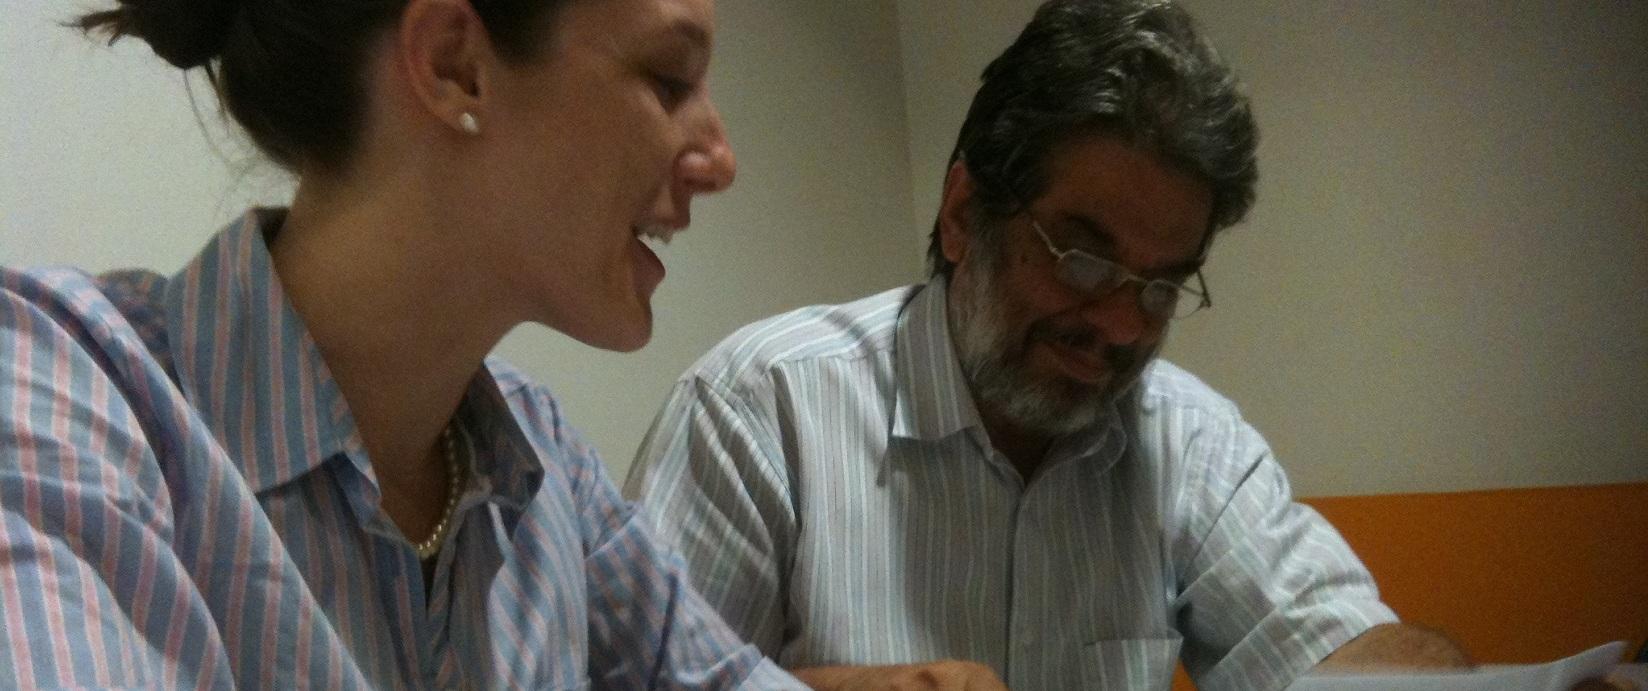 A Factta coordena o Projeto Diálogos Porto Digitais.